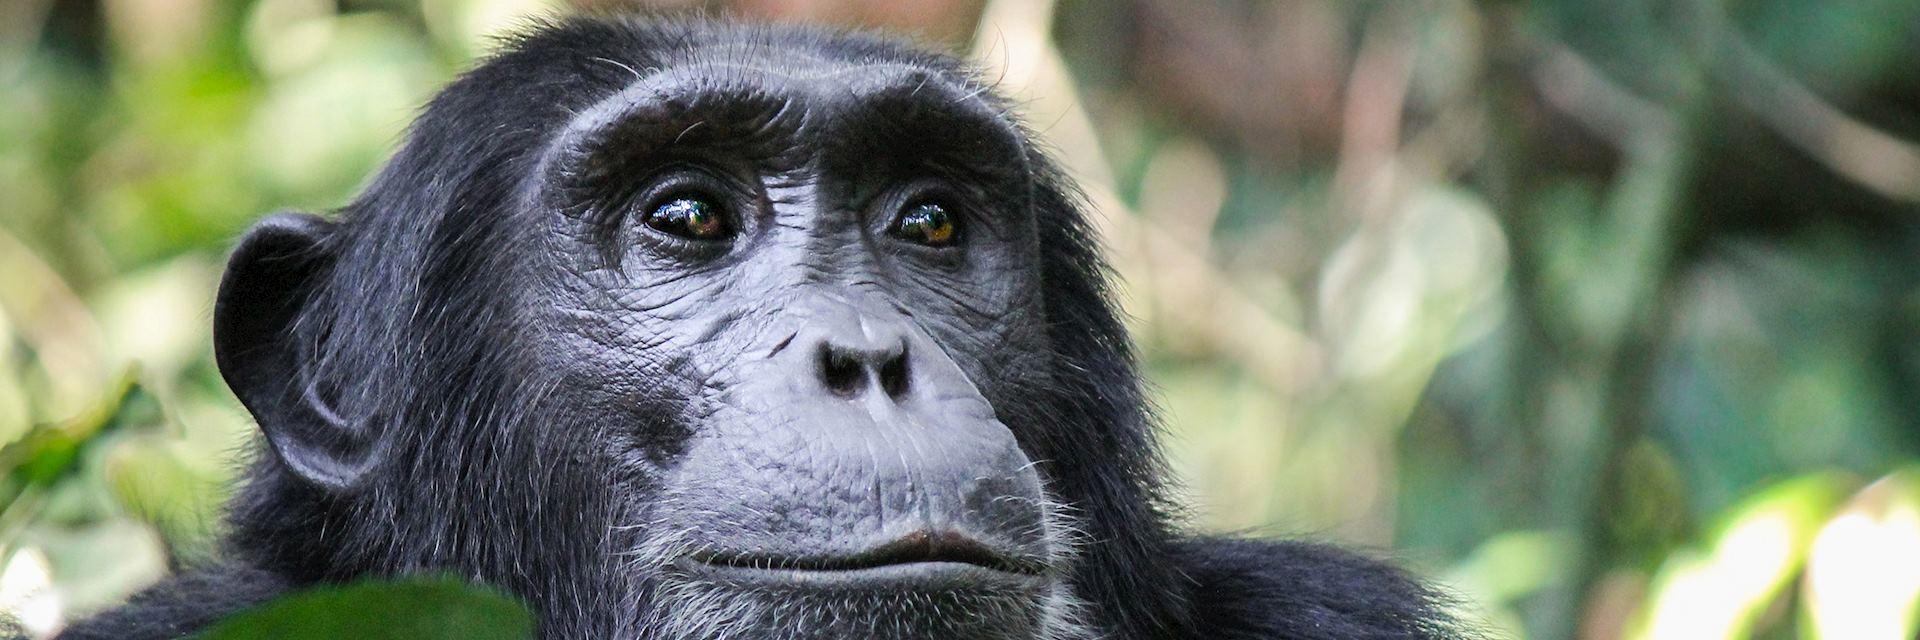 Chimpanzee on Rubondo Island